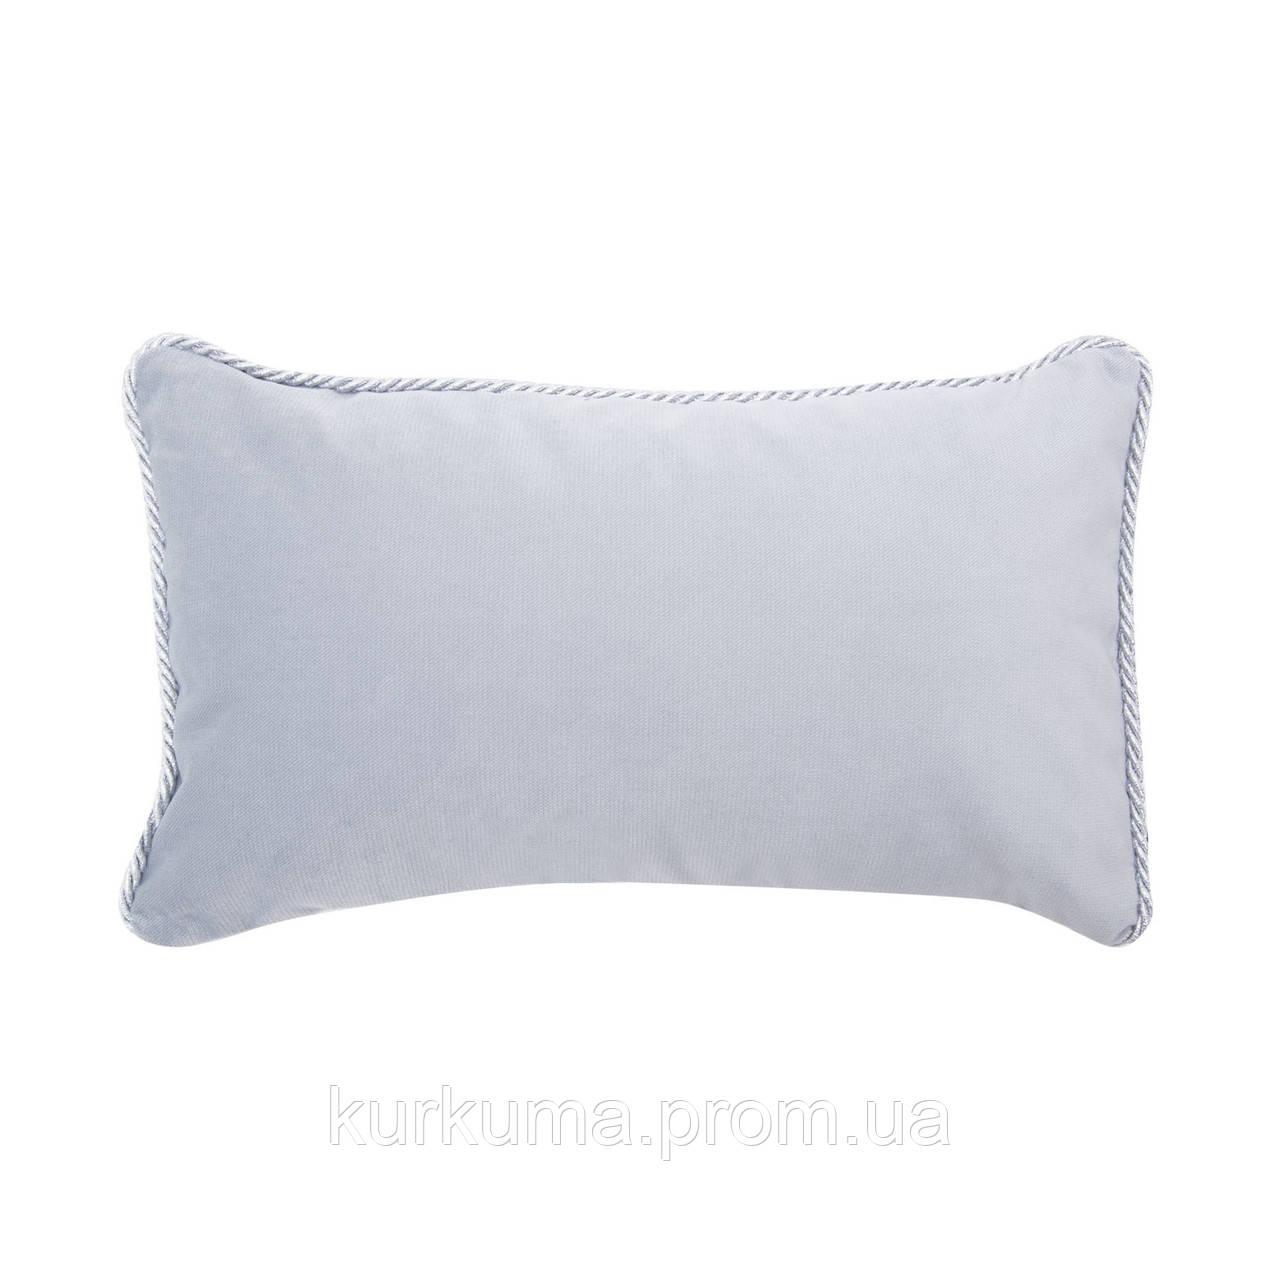 Декоративная подушка SMOOTH 30x50 см